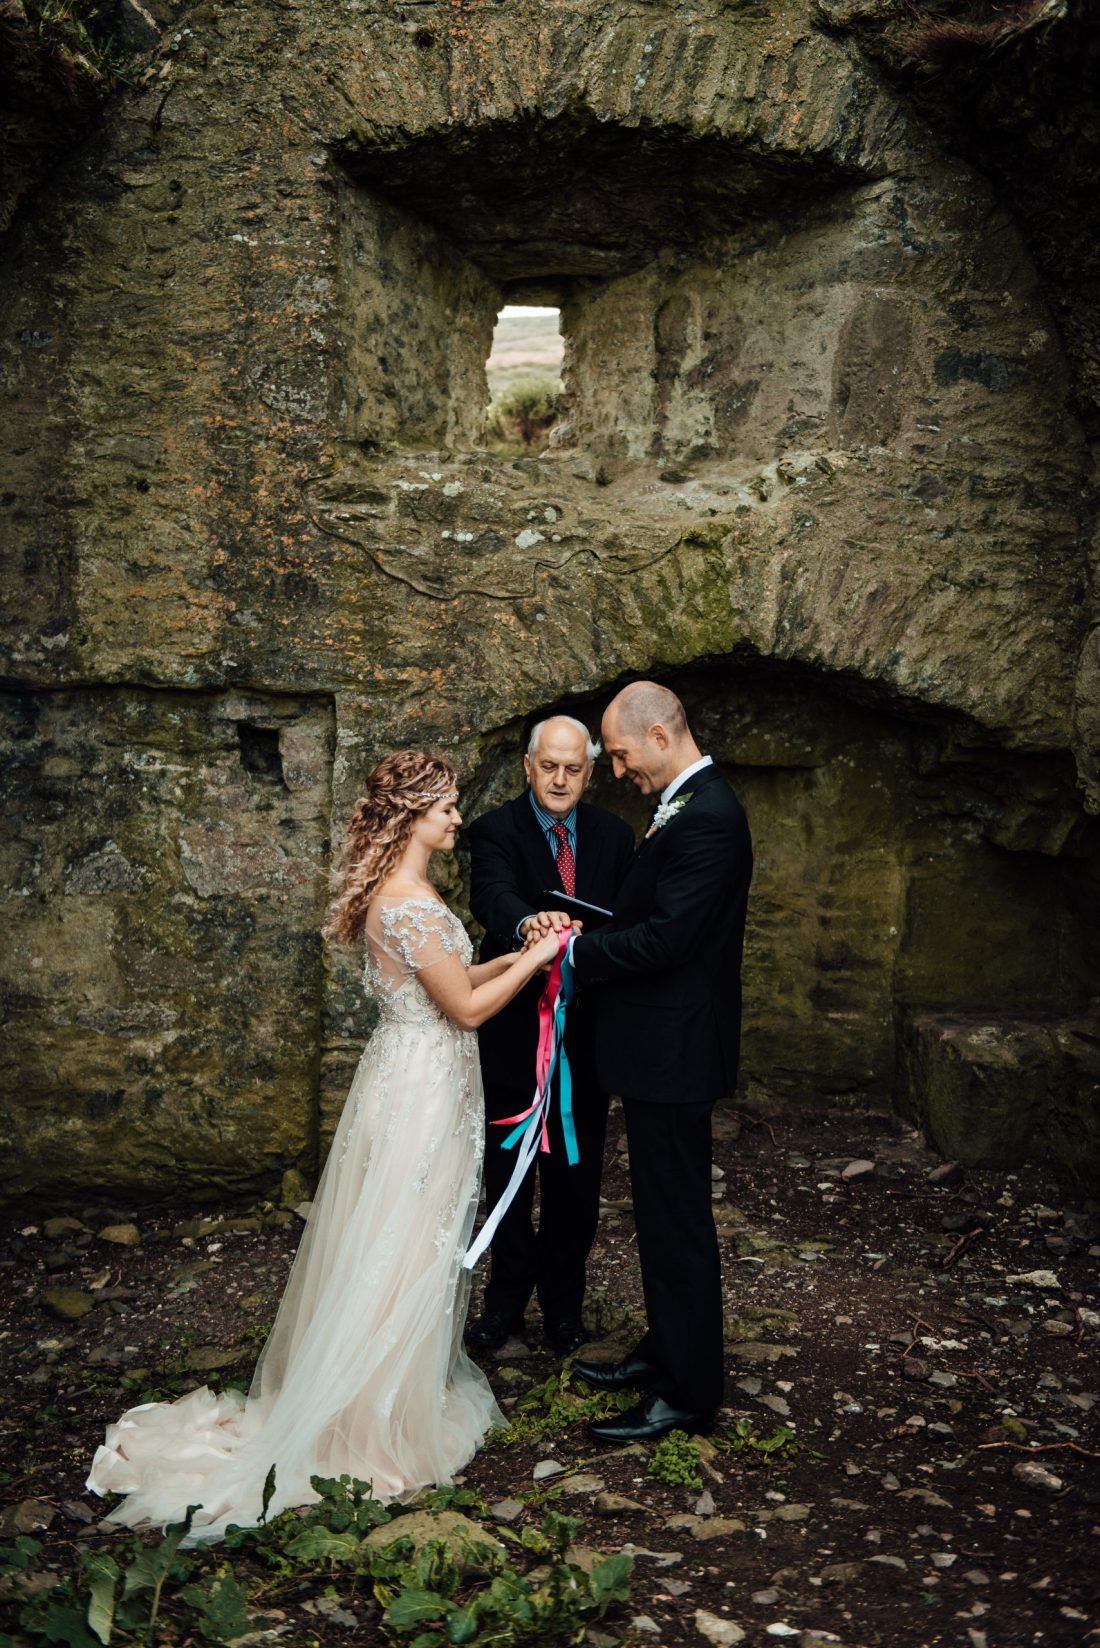 Wedding in a ruined castle